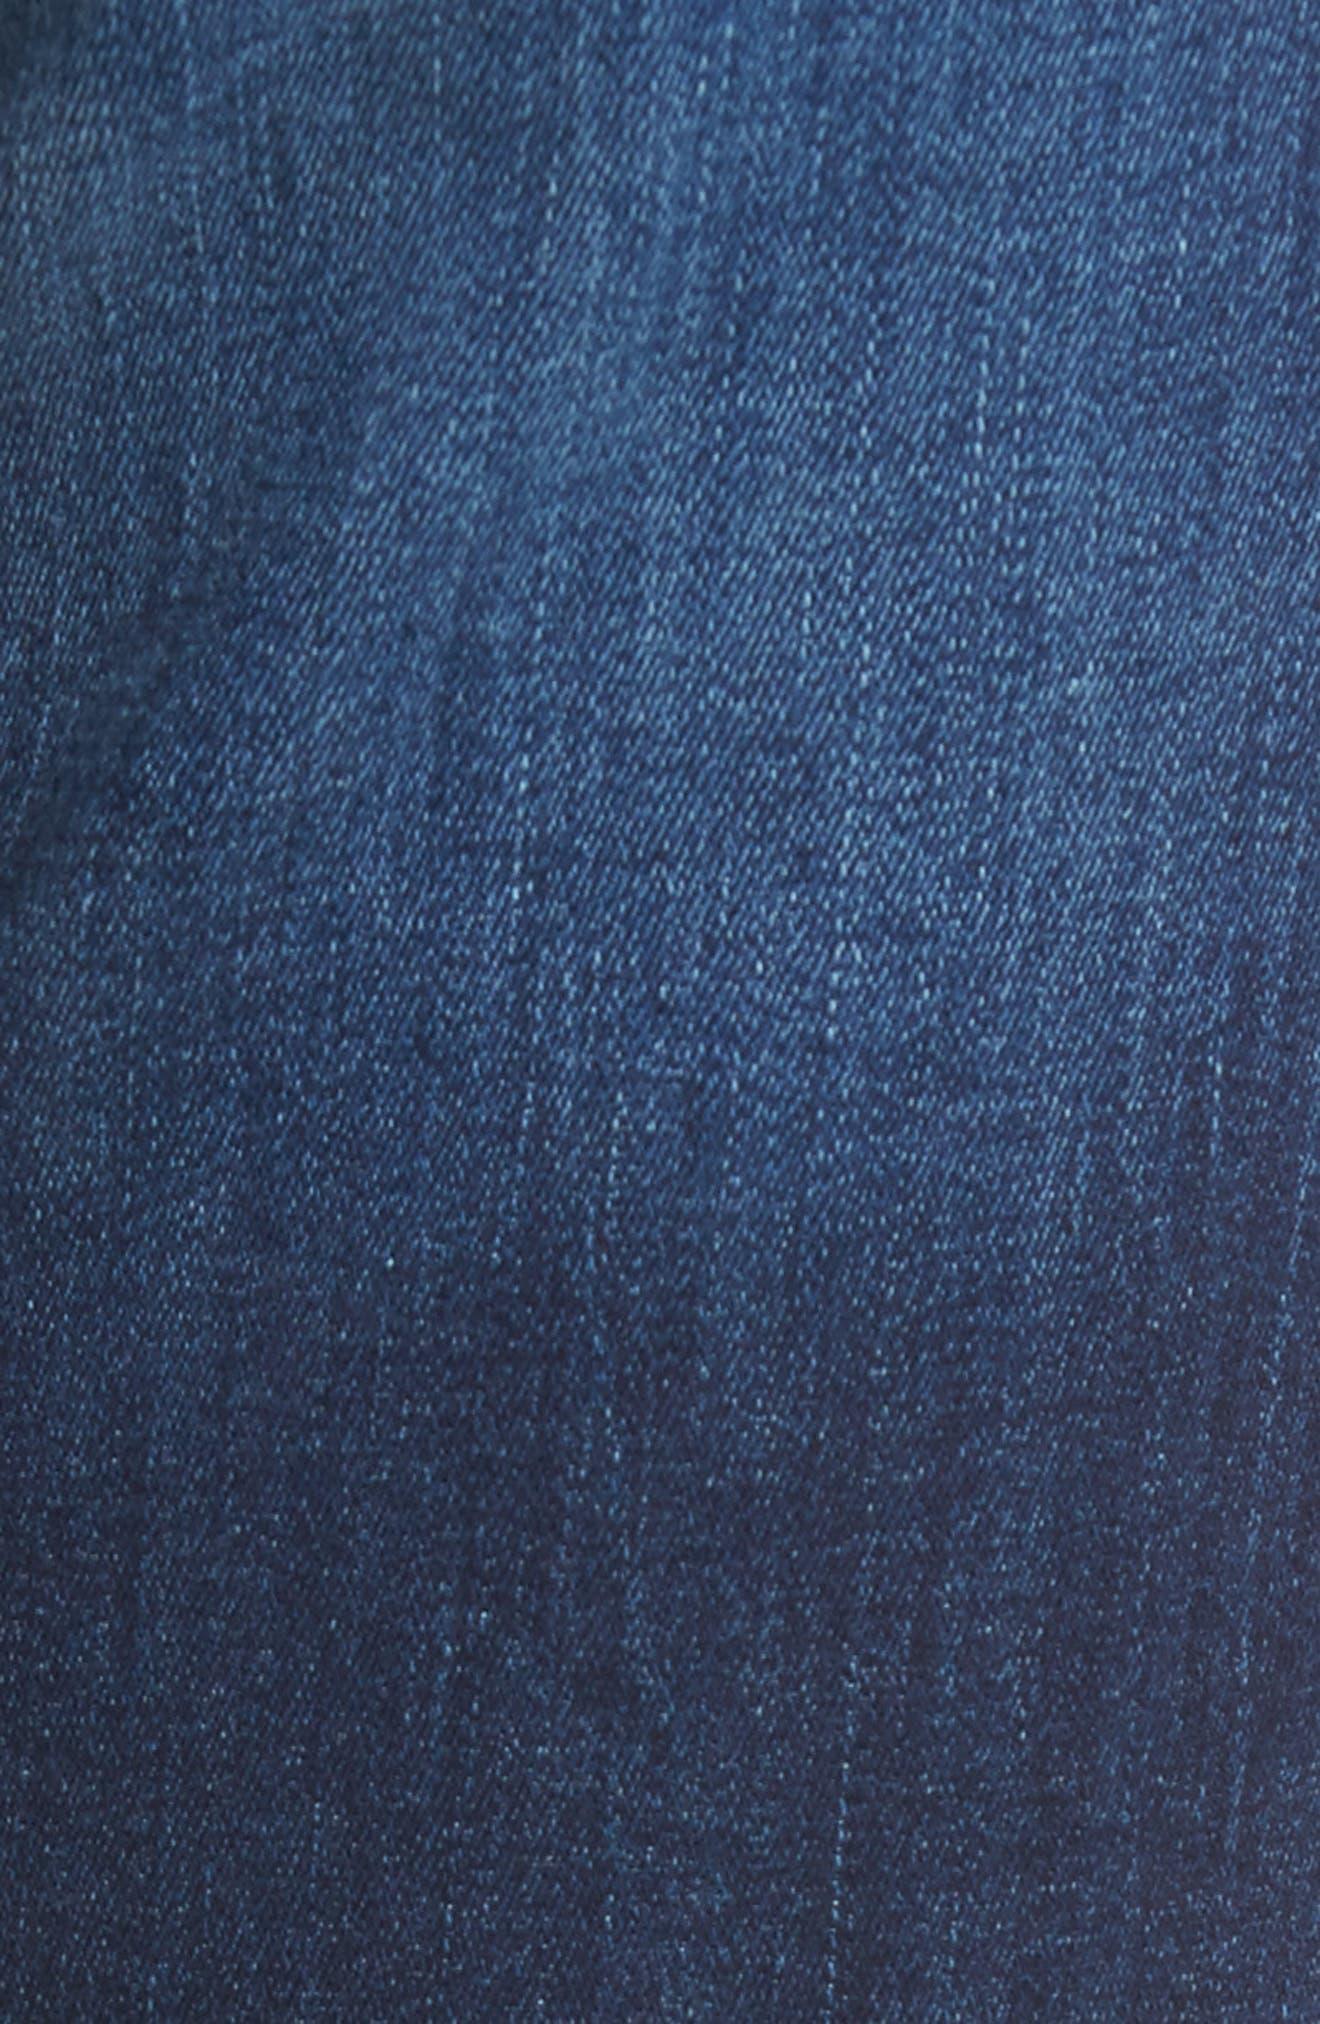 Coco Curvy Slim Straight Leg Jeans,                             Alternate thumbnail 6, color,                             405